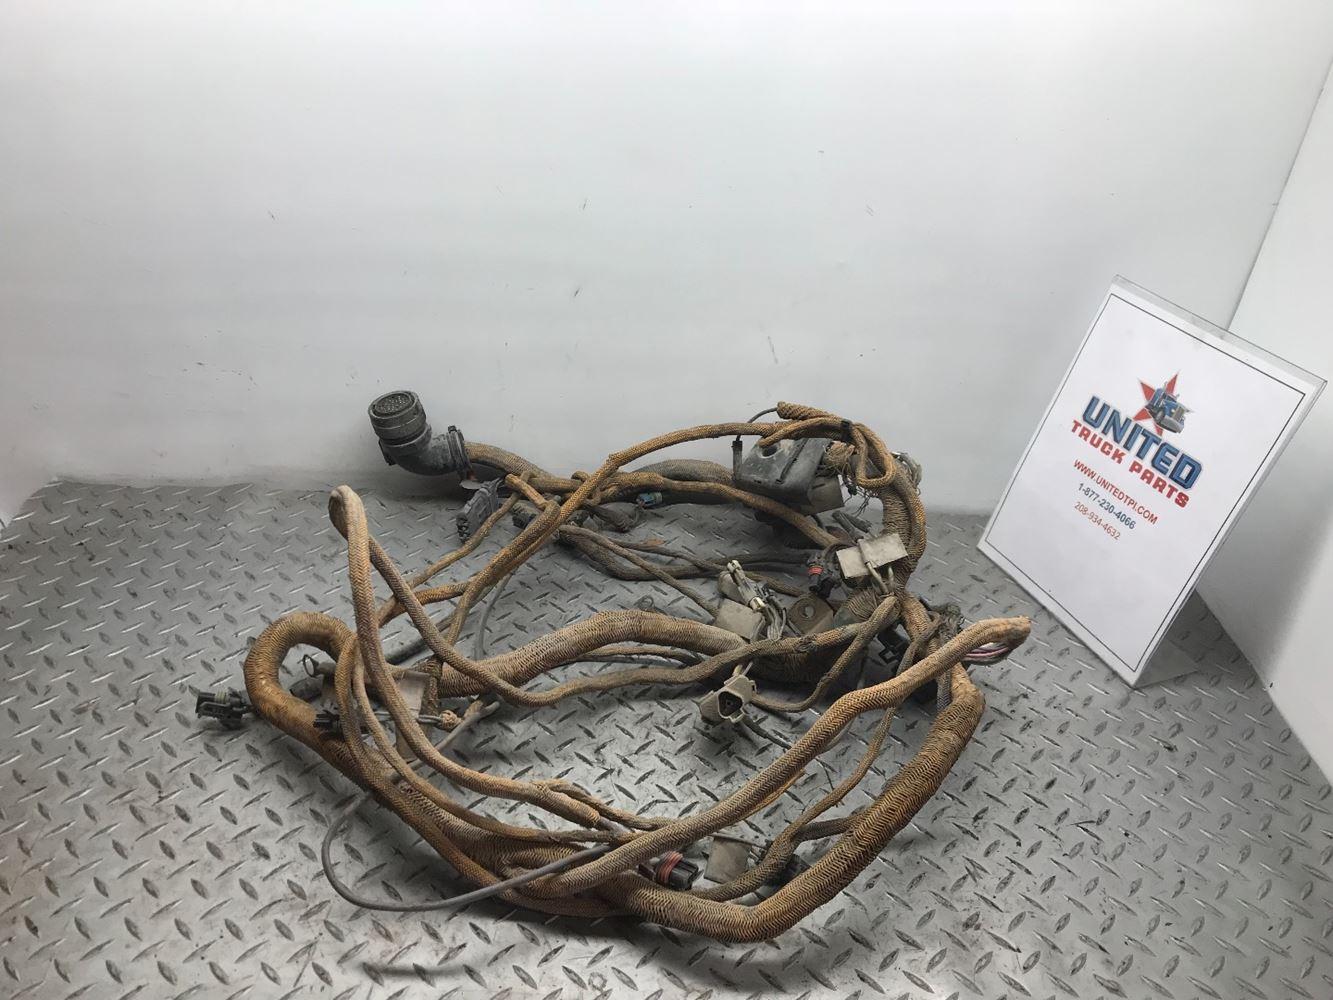 Wiring Harnesses United Truck Parts Inc Cat 3306 Harness Sv 18 08 40 Engine Make Caterpillar